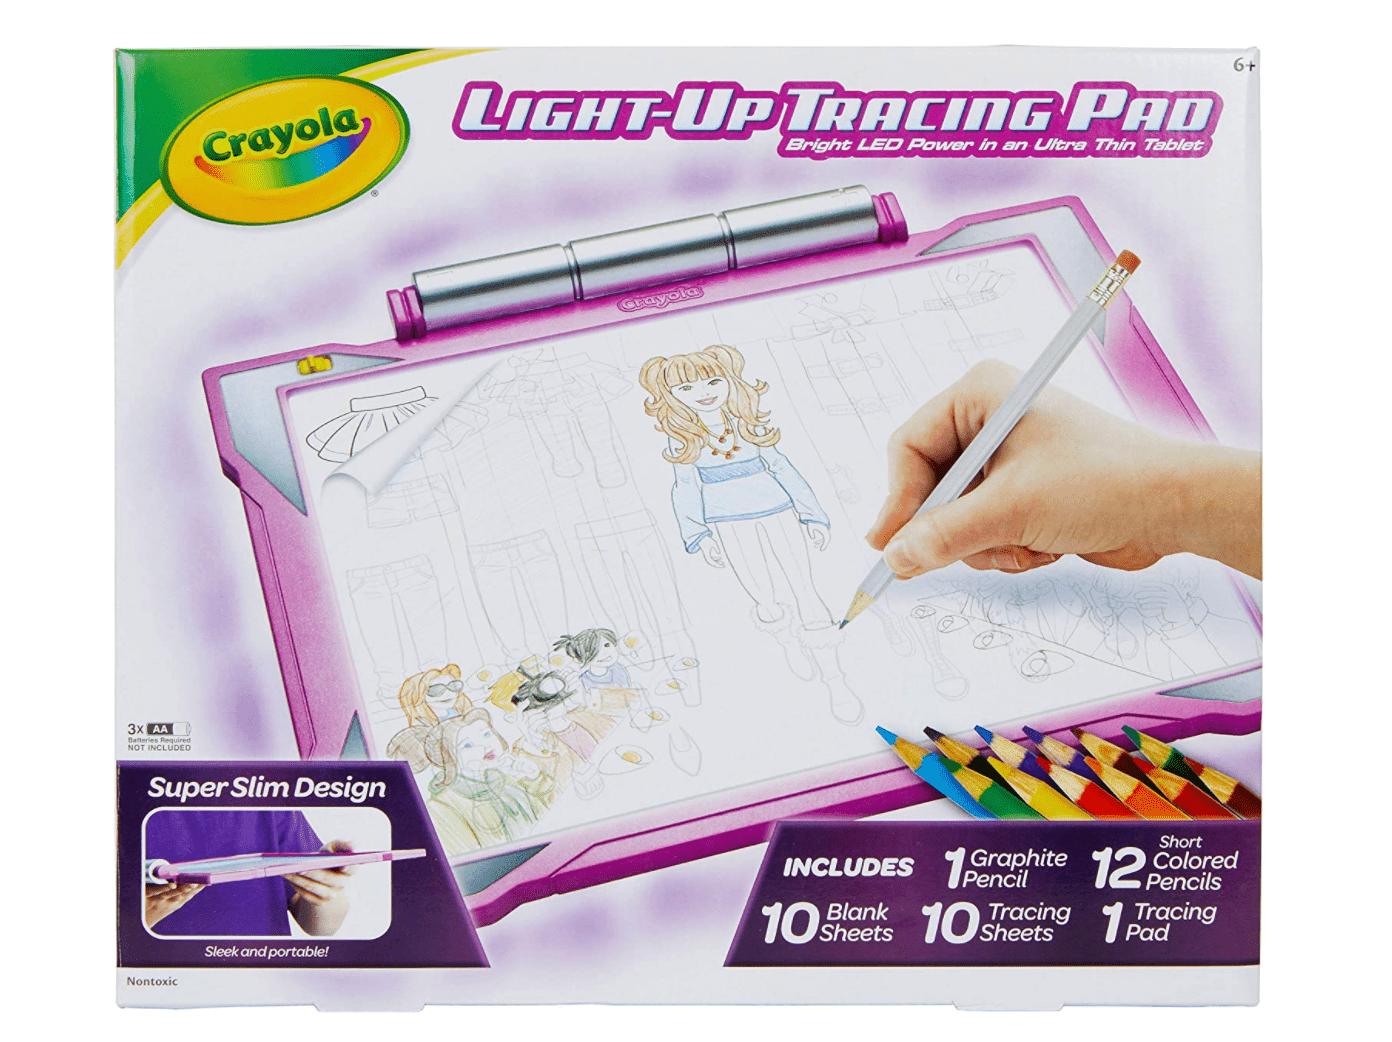 Crayola Light Up Tracing Board